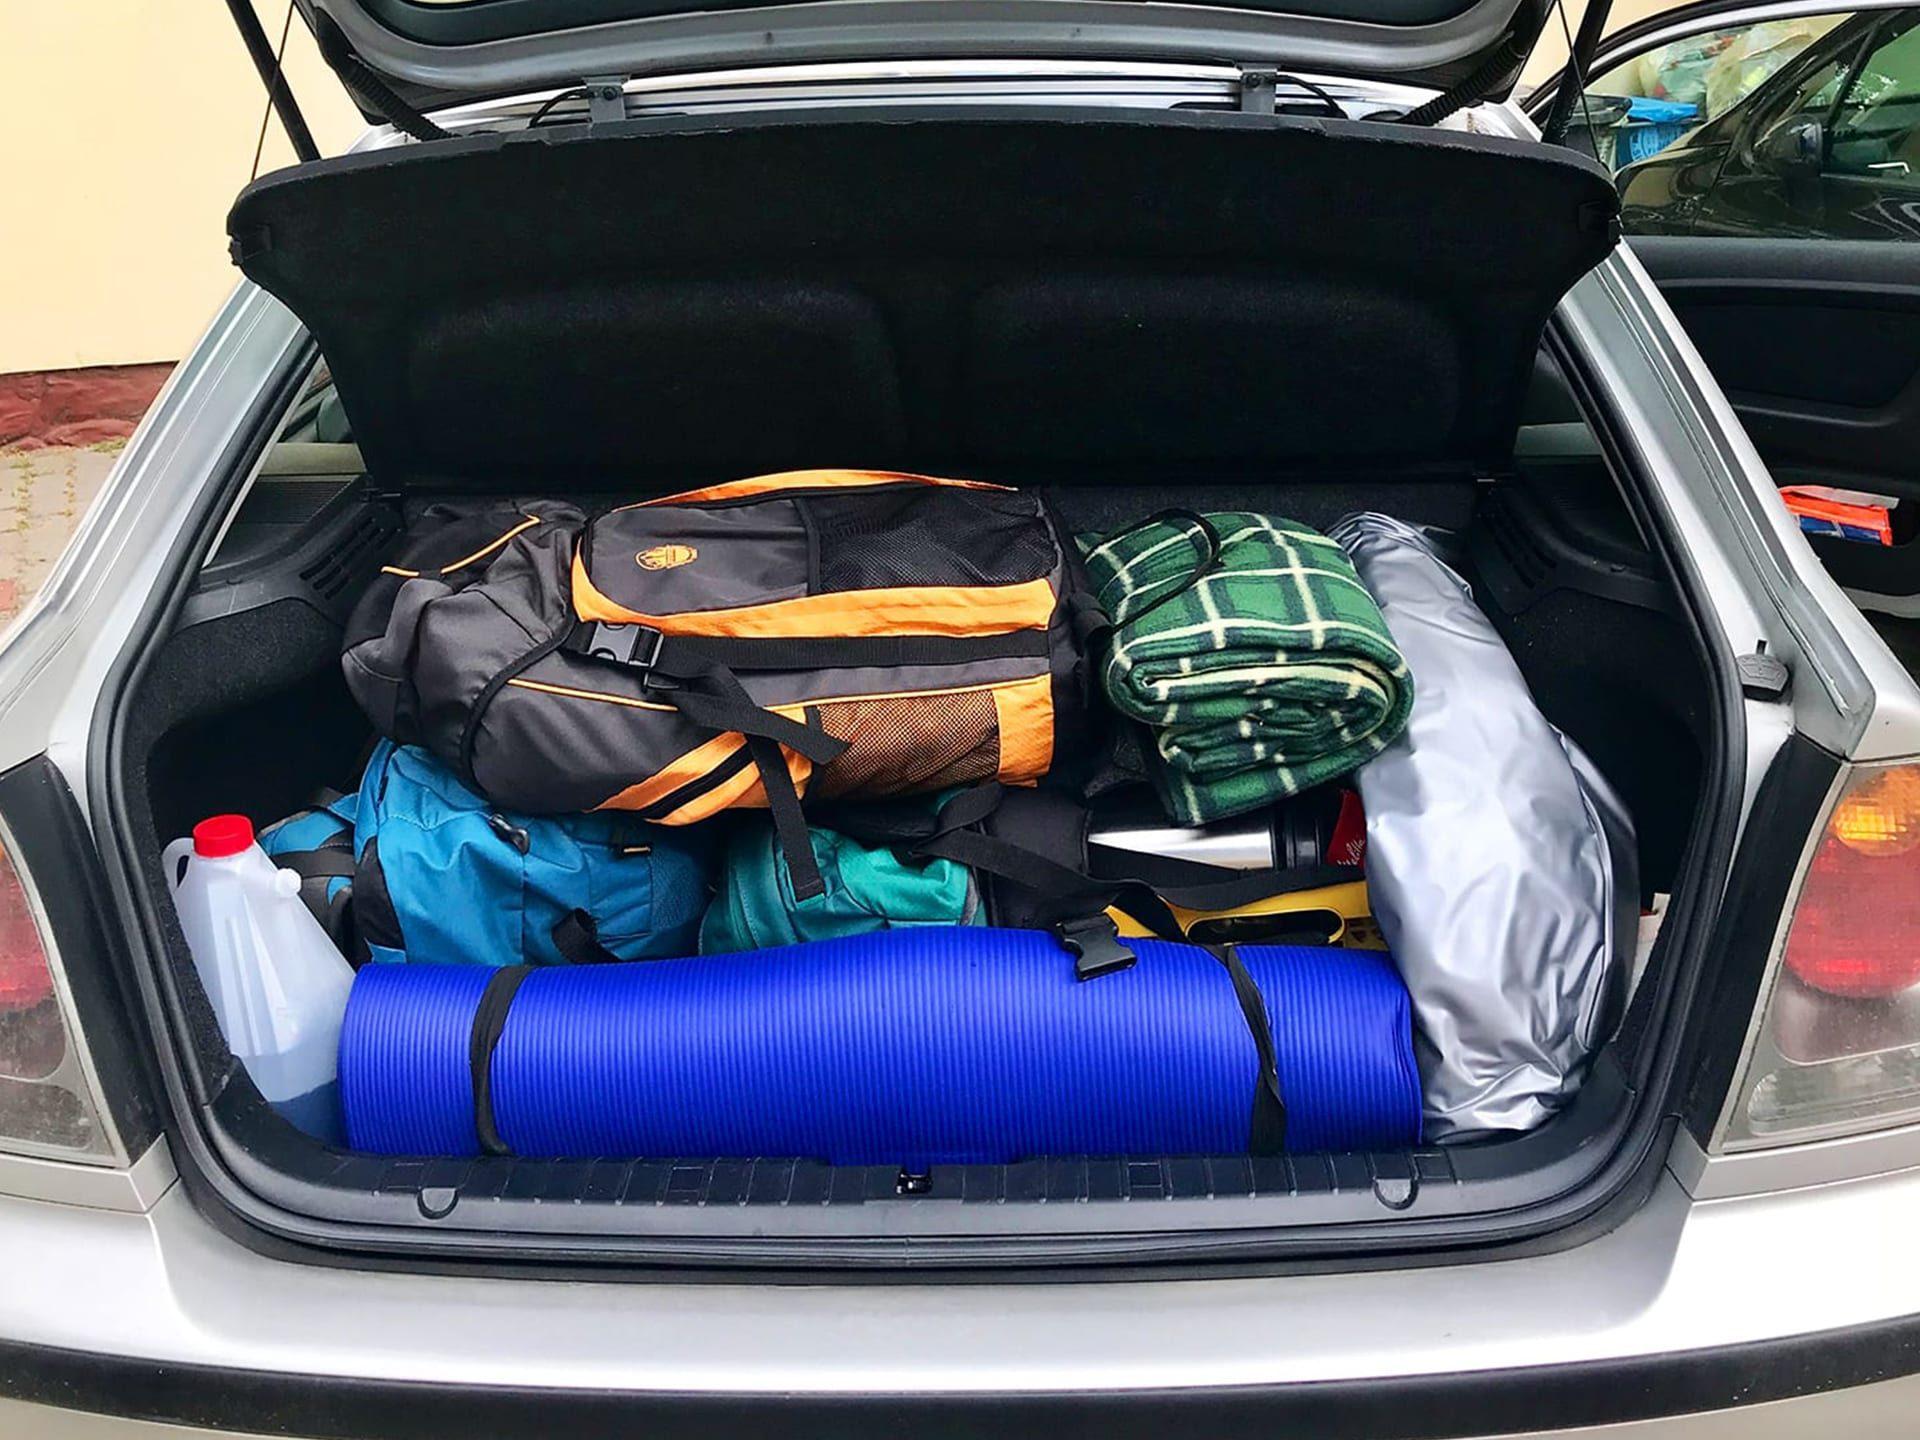 Reisetipps Kroatien: Campingurlaub